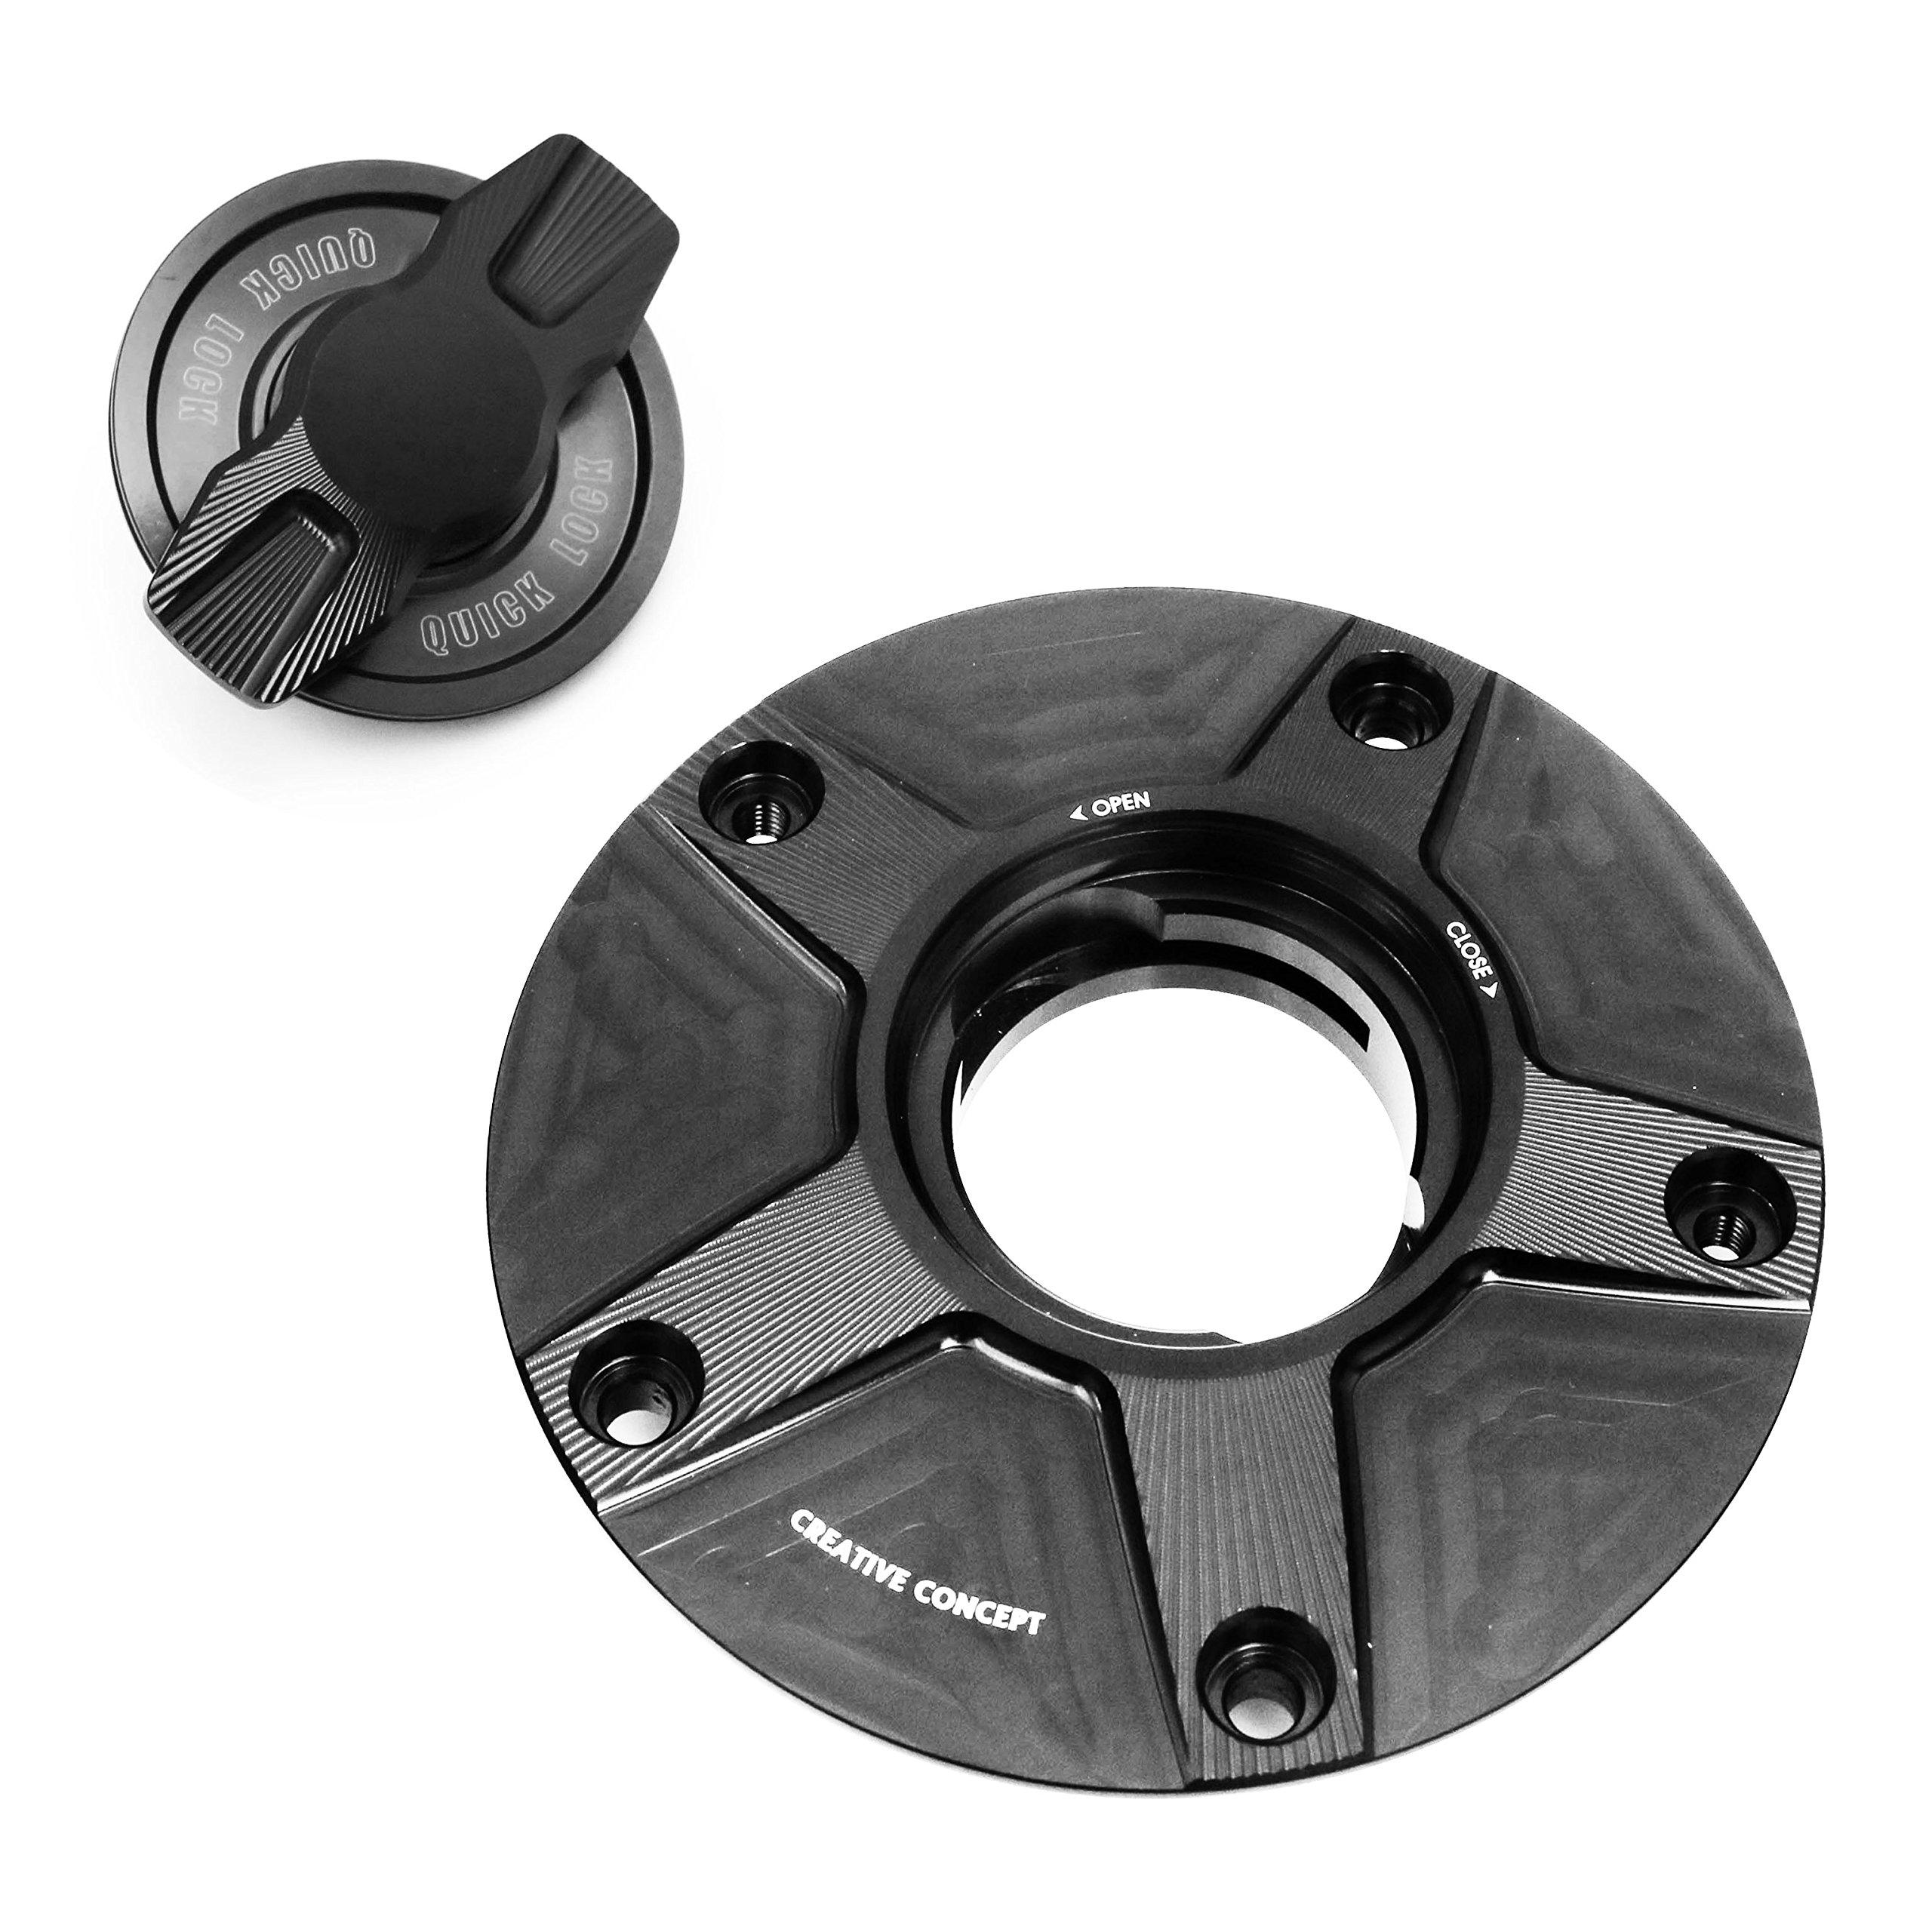 NIMBLE Black CNC 1/4 Quick Lock Fuel Cap For Yamaha MT-01/XJR 1200/XJR 1300 SP All Year